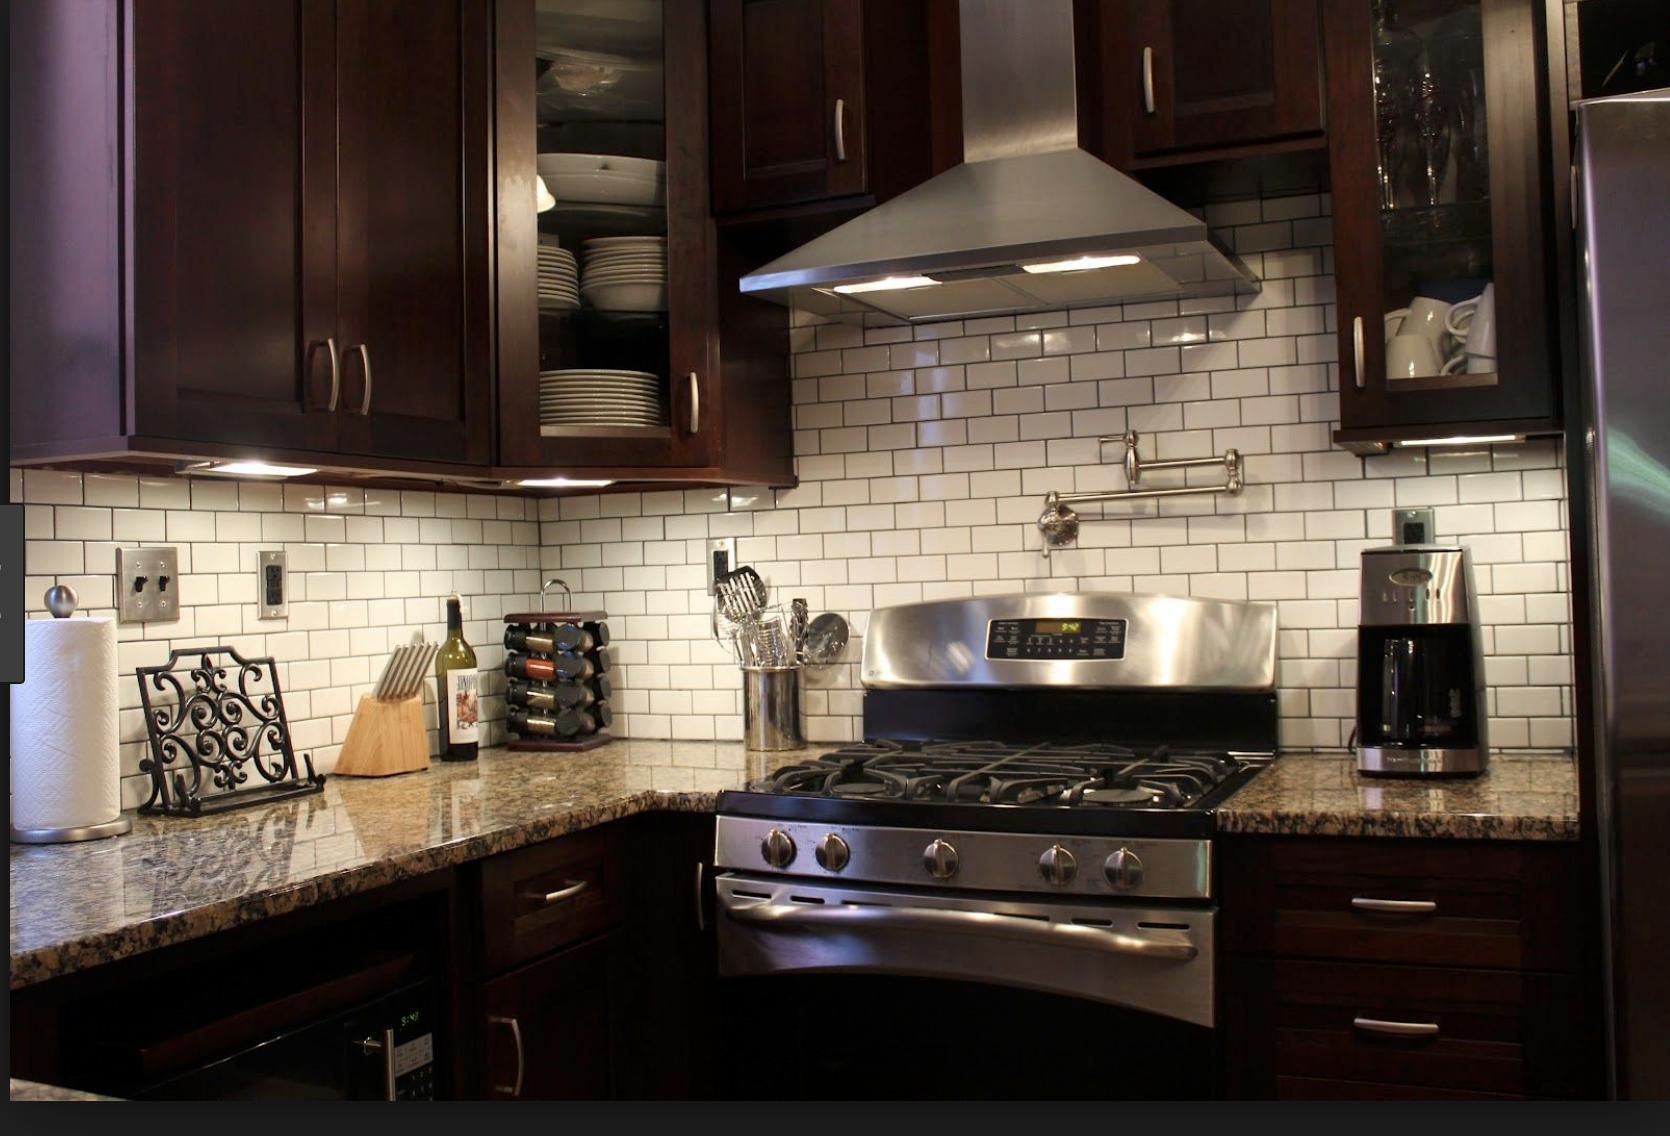 white tile backsplash, mahogany brown granite